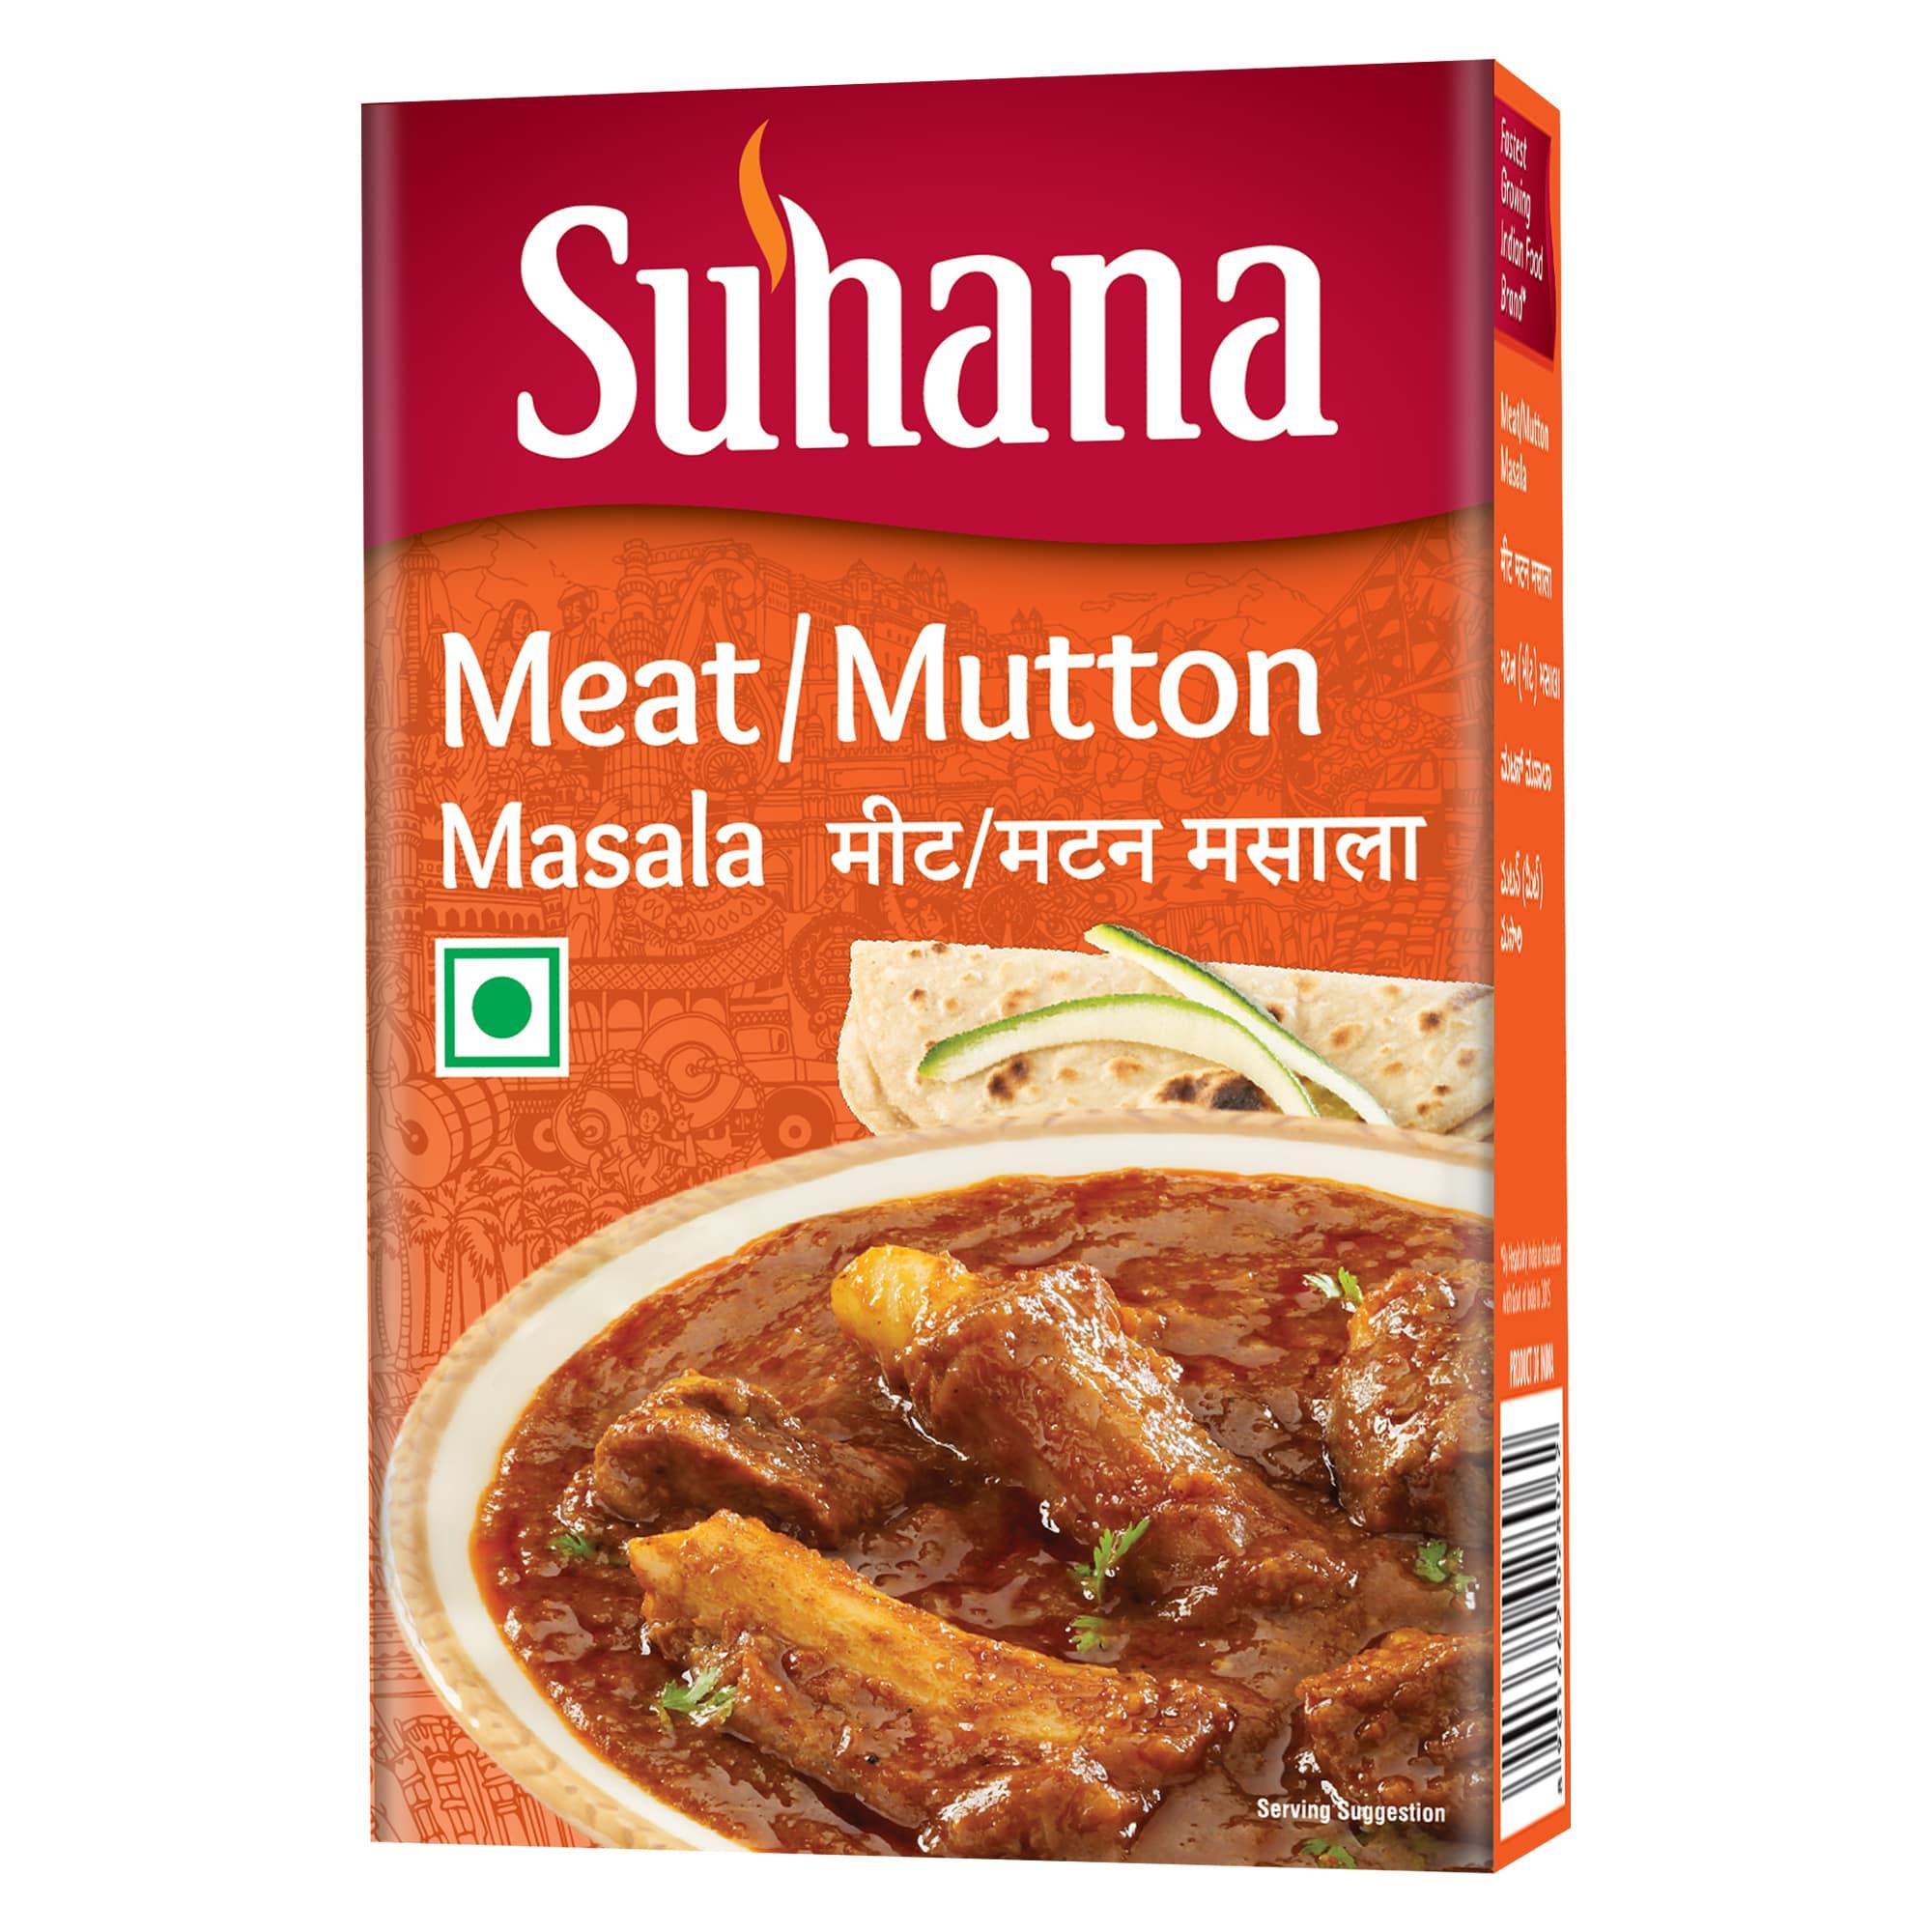 Suhana Mutton (Meat) Masala Box